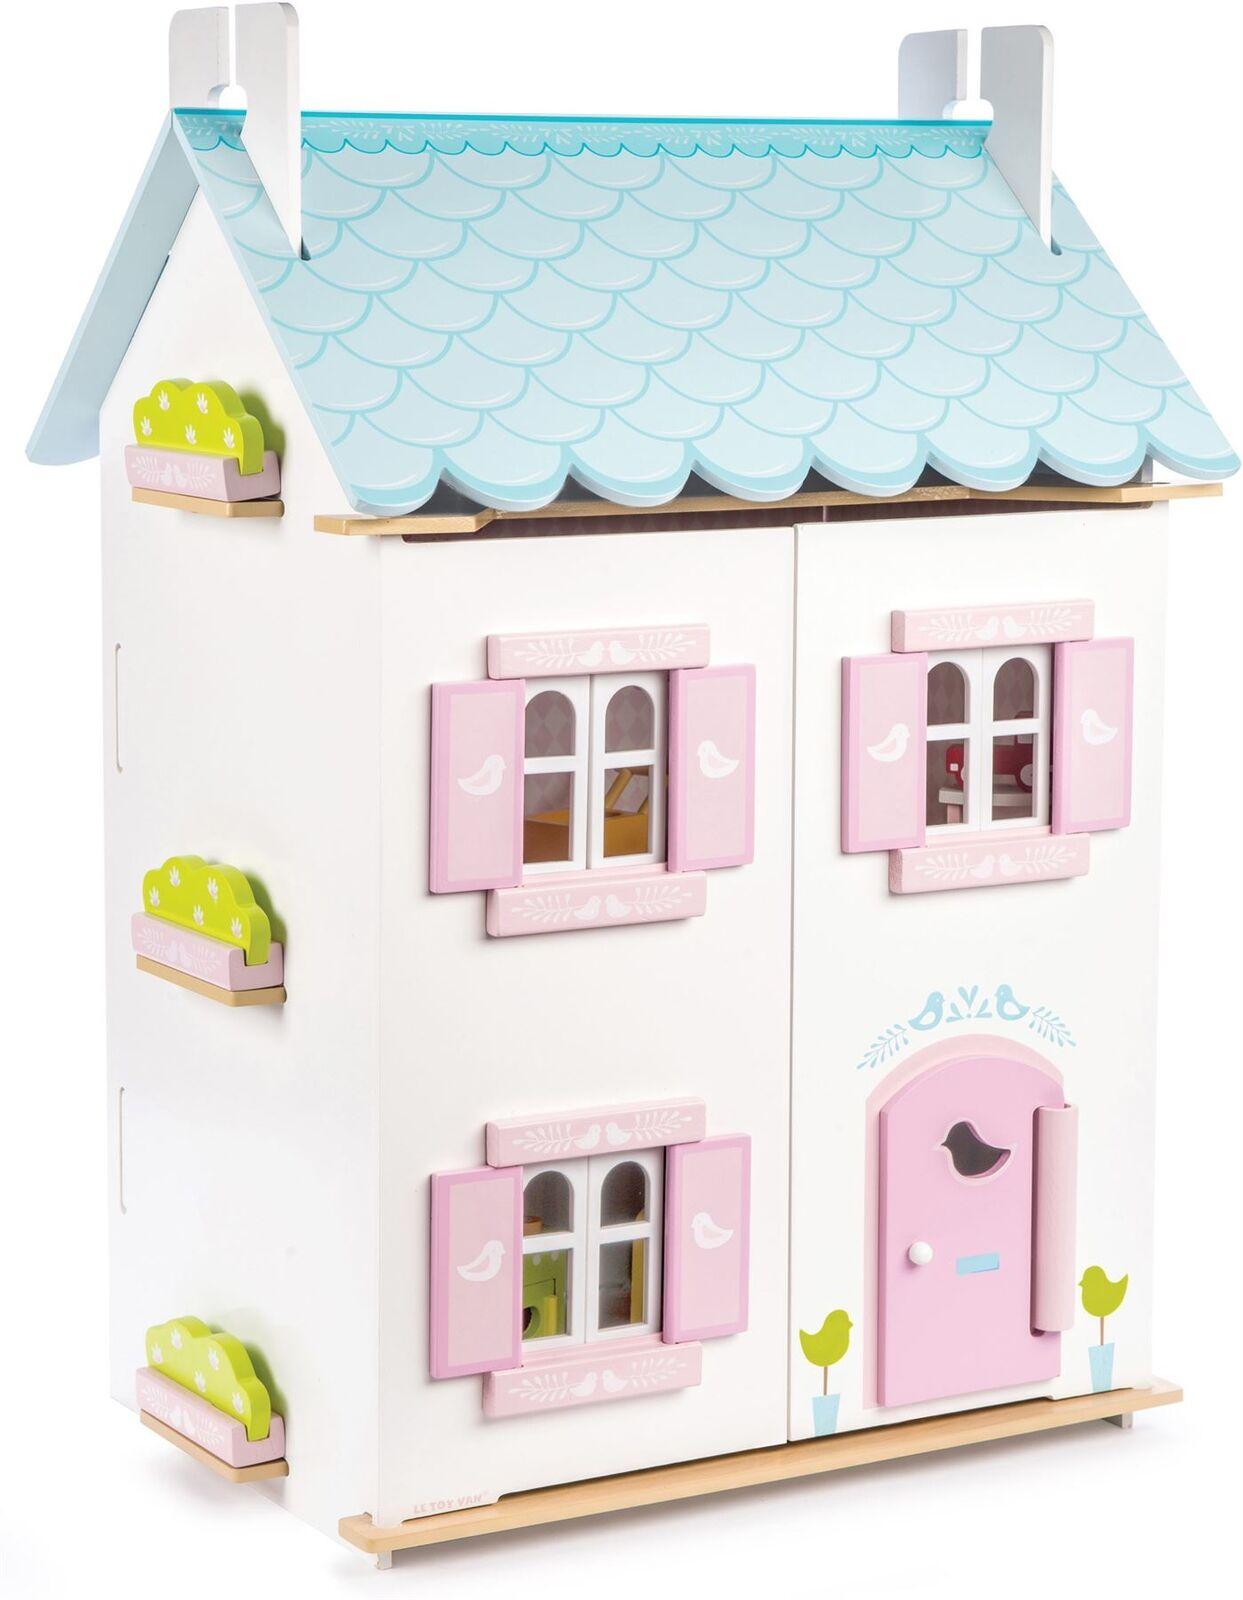 Le Toy Van DOLLHOUSES blueE BIRD COTTAGE INC FURNITURE Wooden Dolls House BN